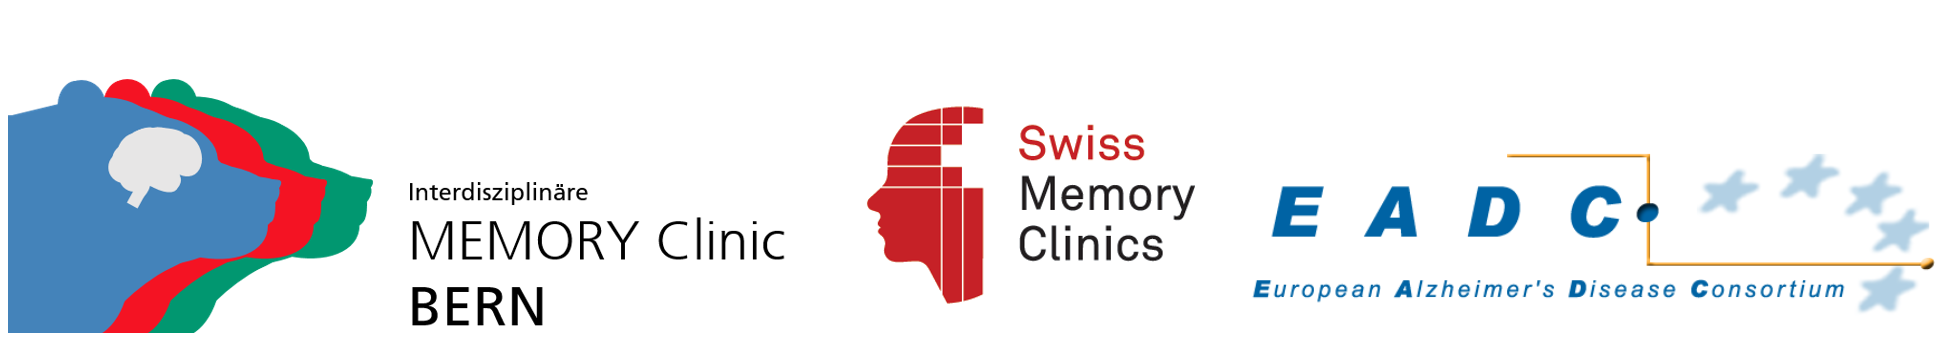 Memory Clinic Bern